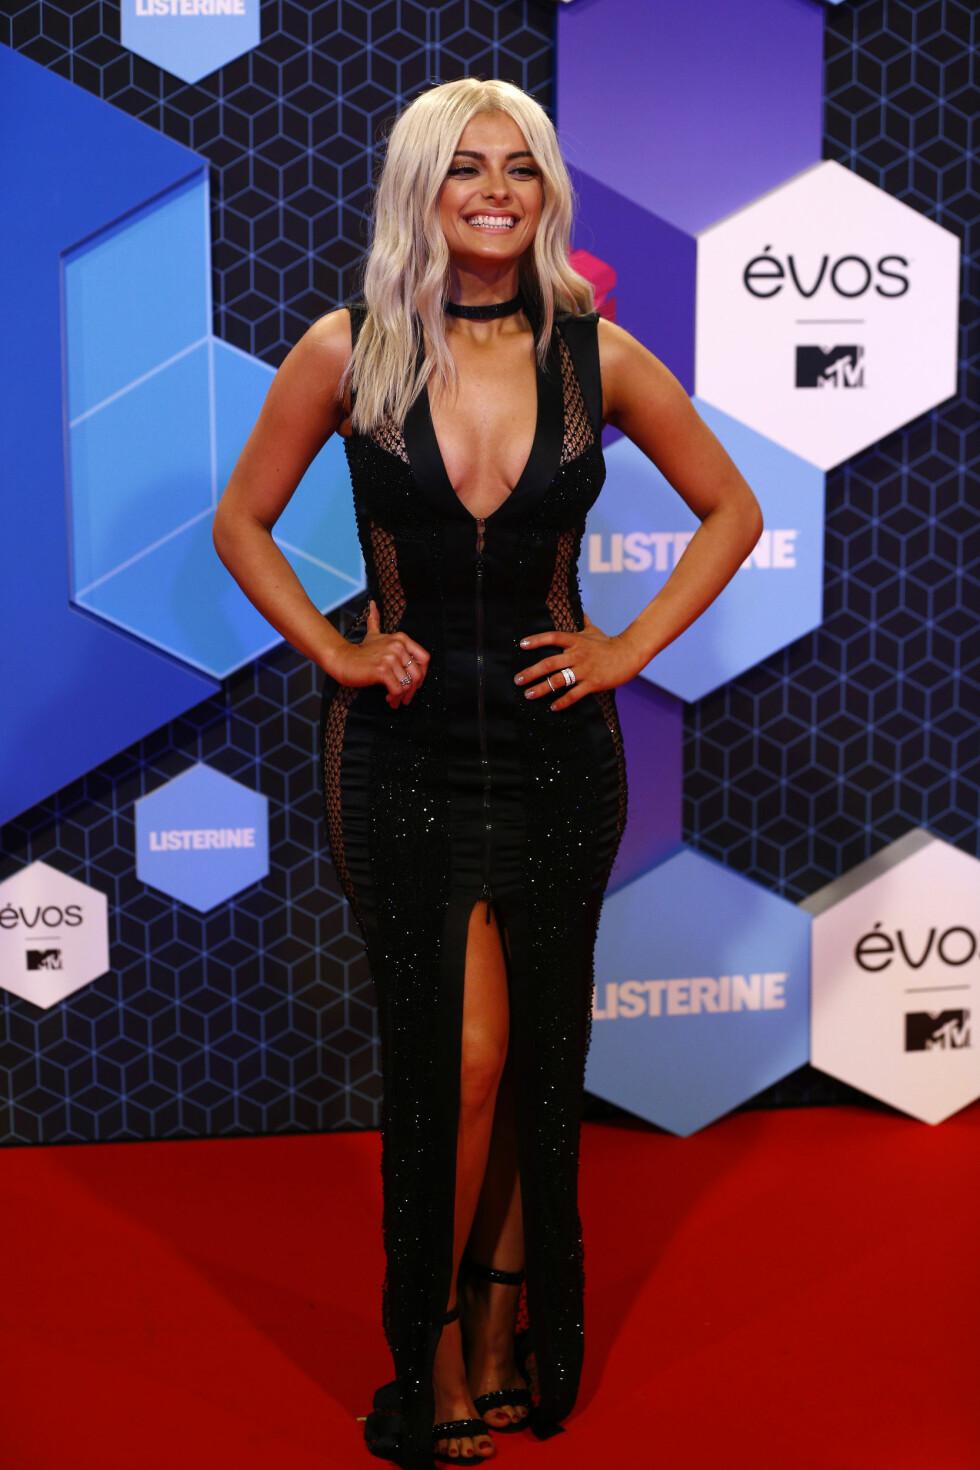 Årets MTV EMA-programleder, sangeren Bebe Rexha. Foto: Reuters